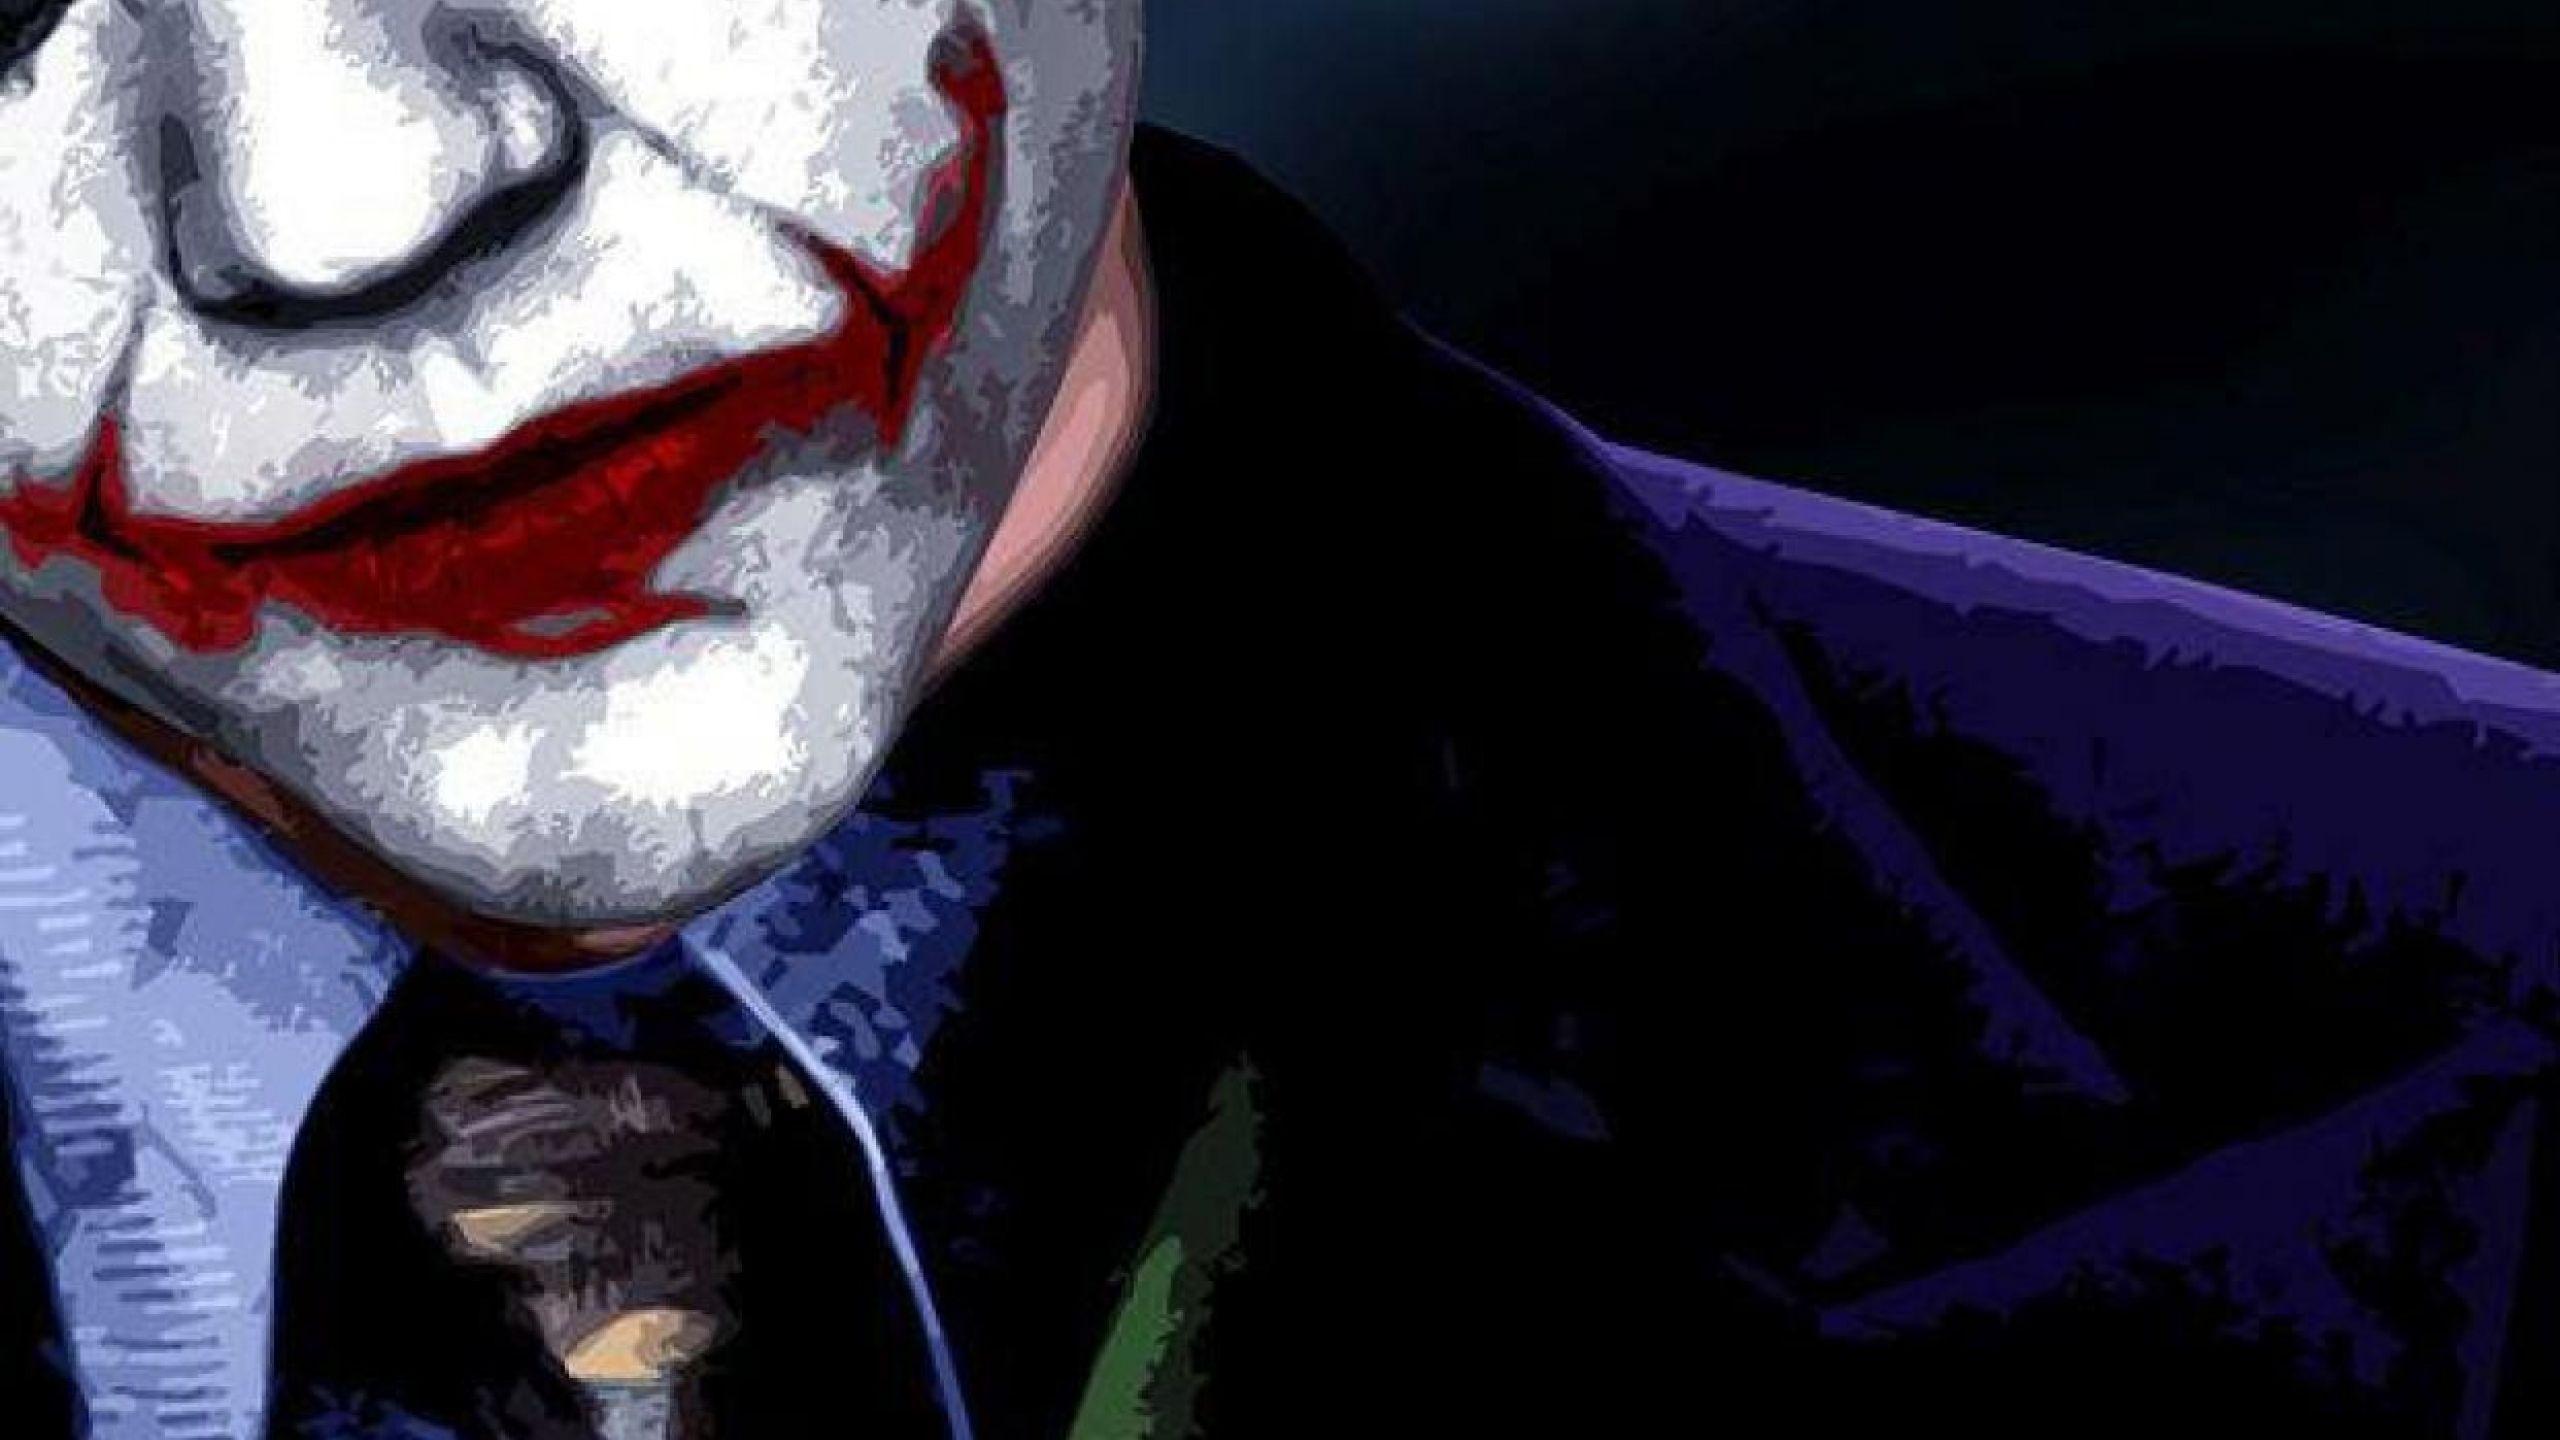 Dark Knight Joker In 4k Ultra Hd Wallpapers Top Free Dark